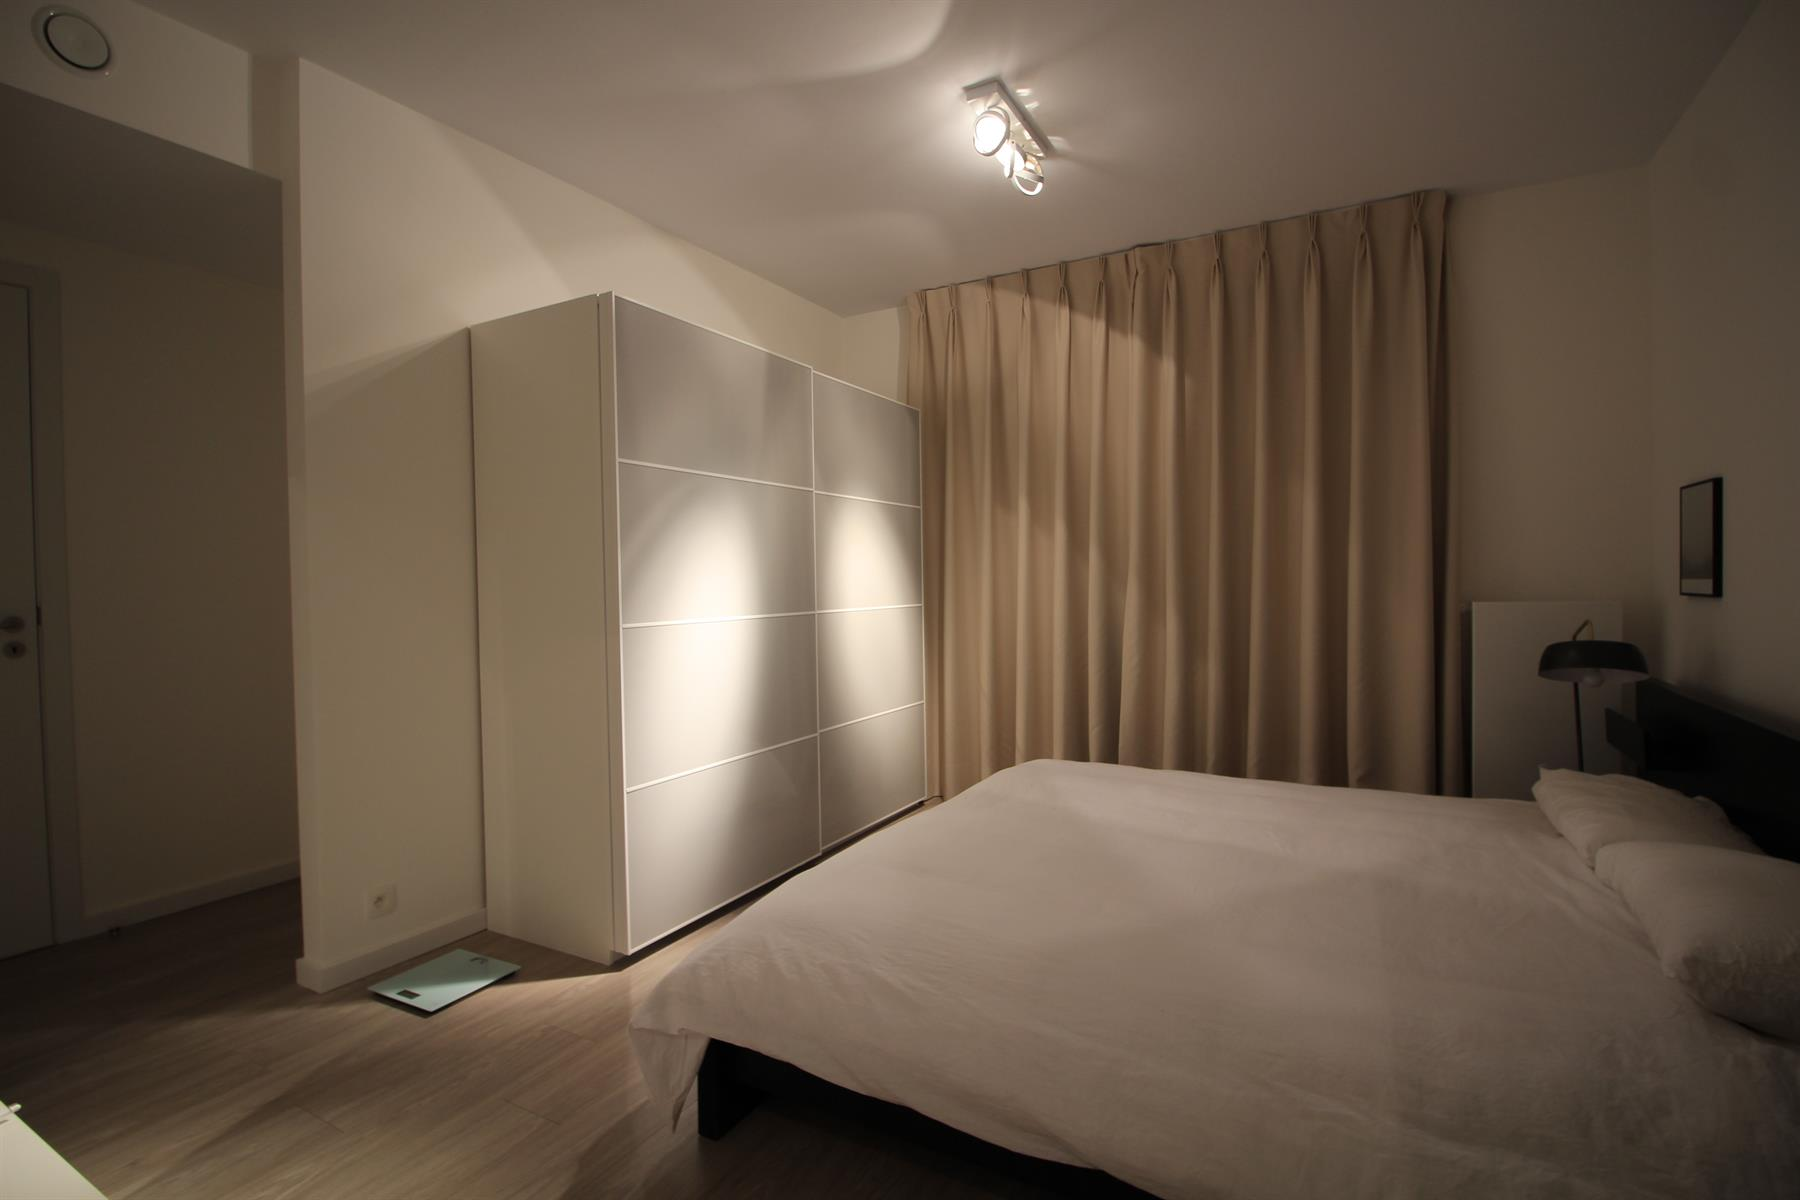 Appartement - Woluwe-Saint-Lambert - #4134958-5